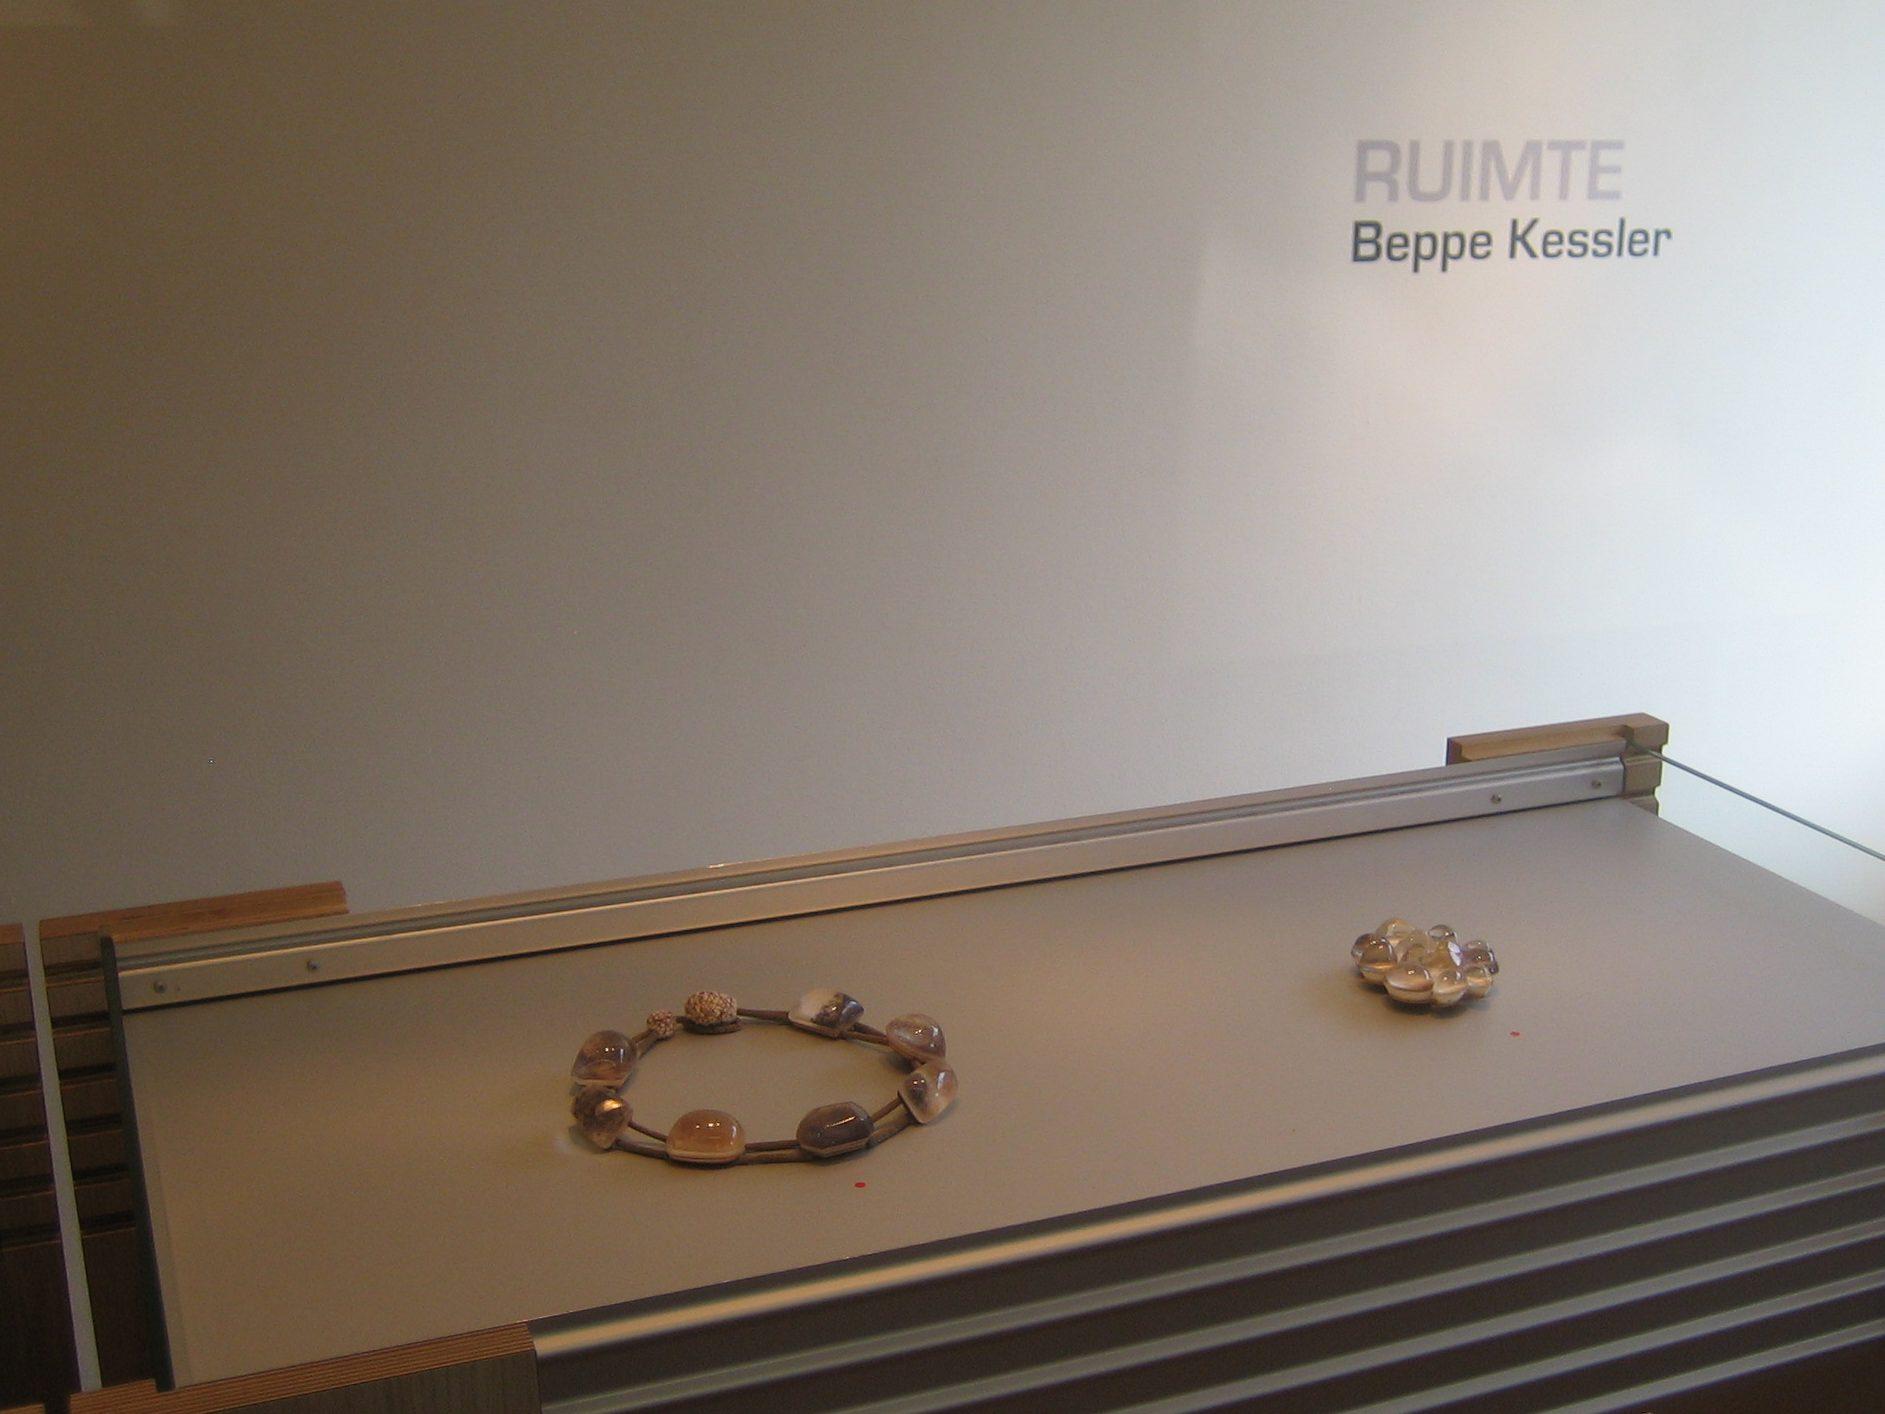 Beppe Kessler, Ruimte, Galerie Rob Koudijs, 2015